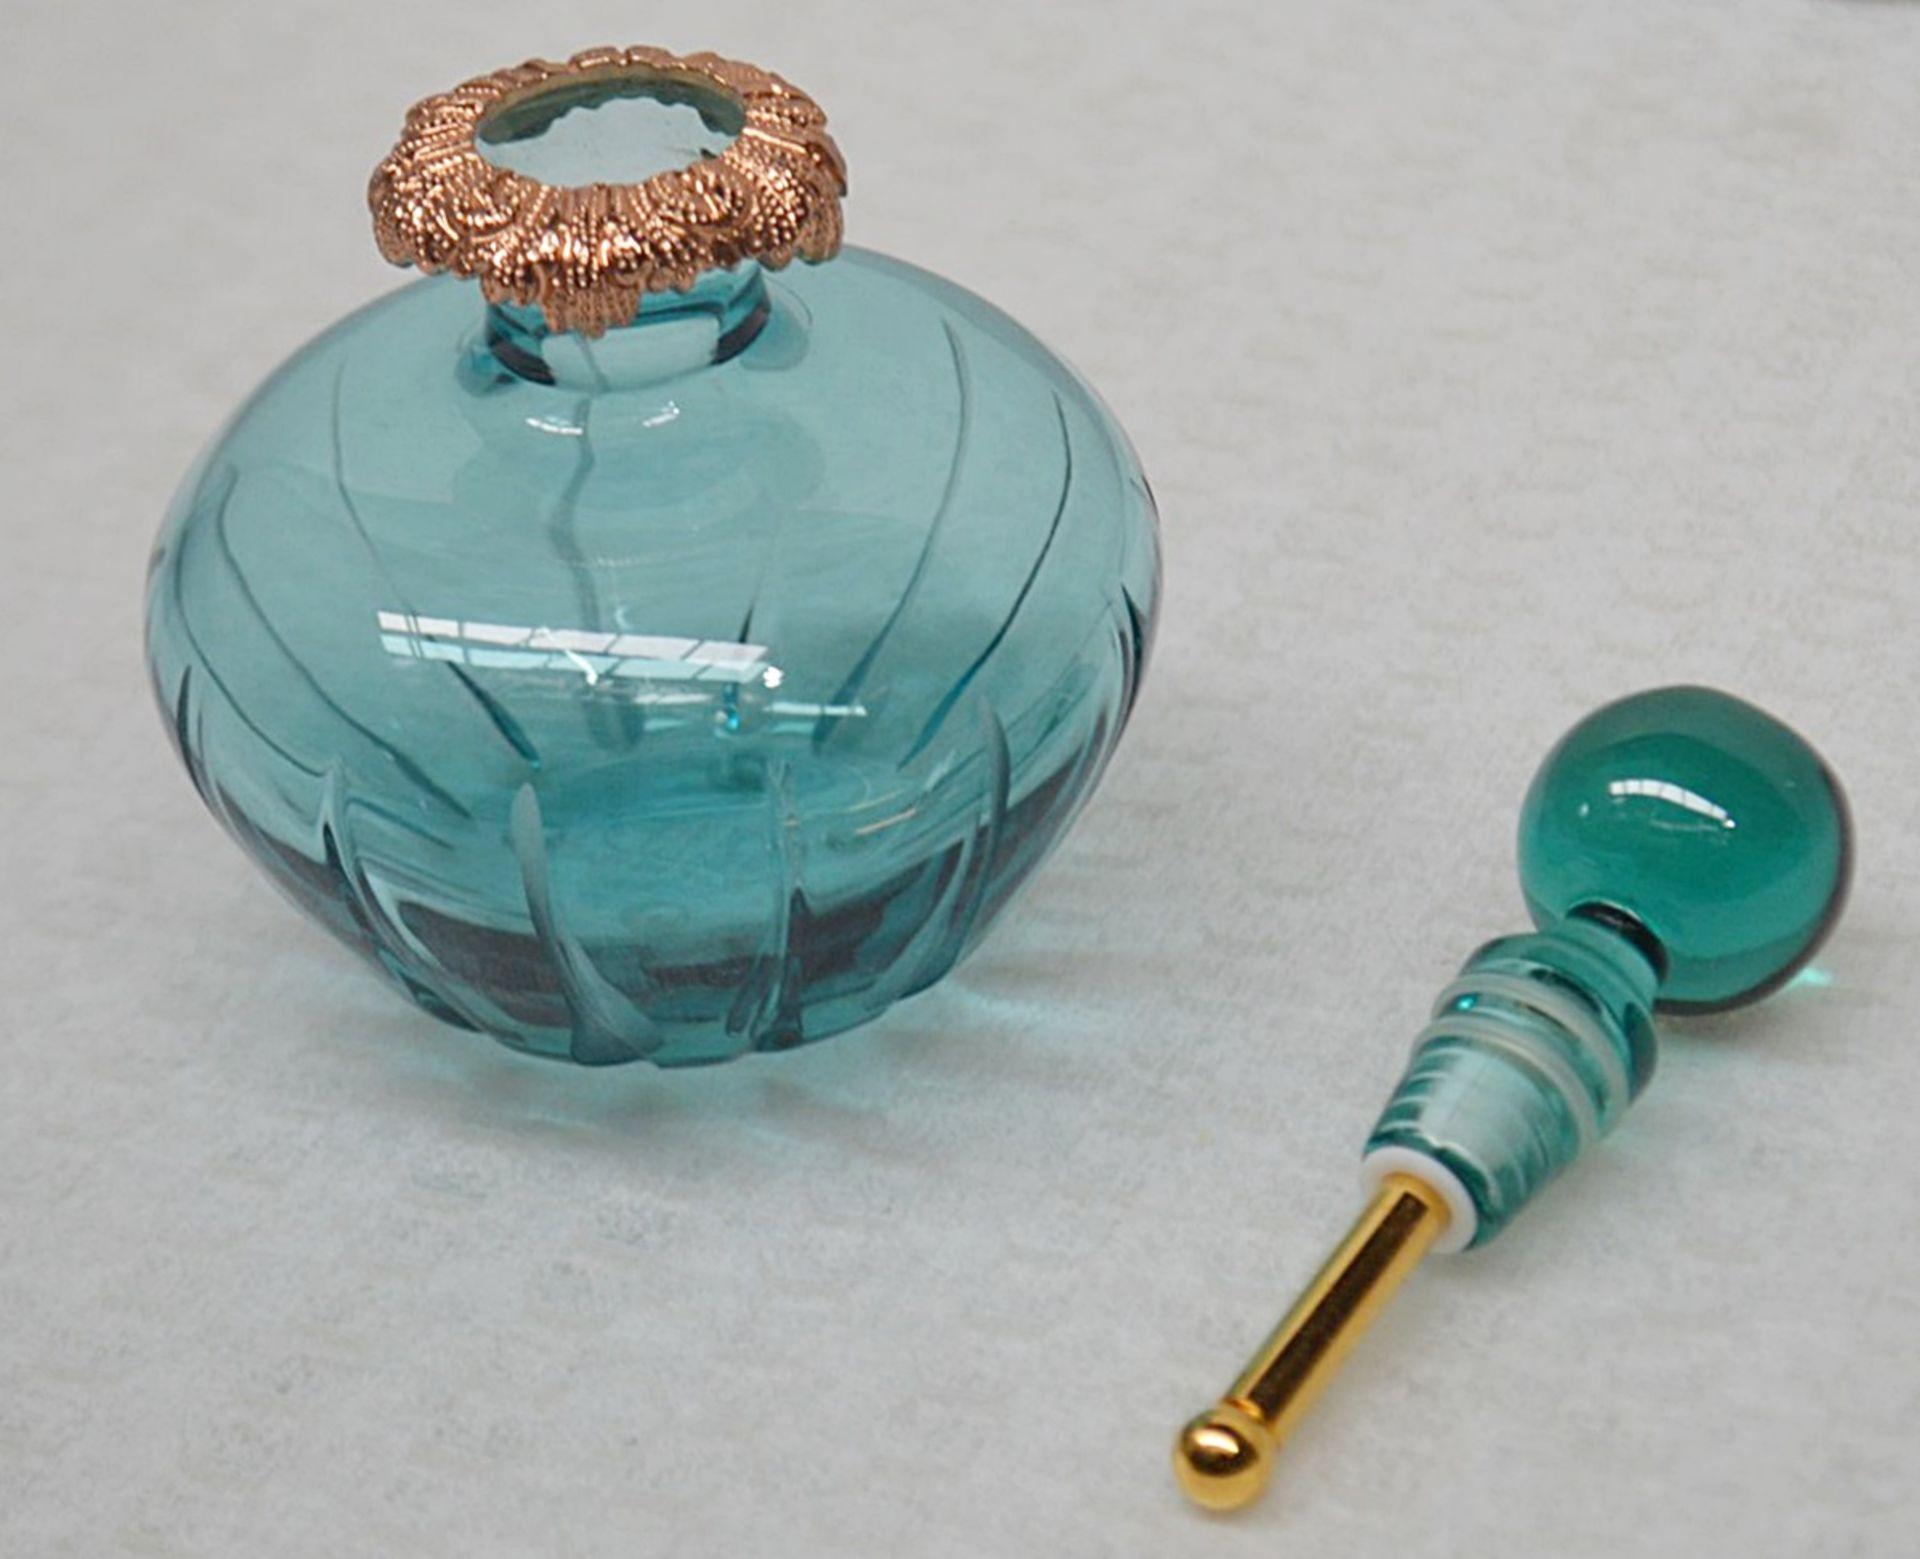 1 x BALDI 'Home Jewels' Italian Hand-crafted Artisan Ottanio Crystal Perfume Bottle & Stick - - Image 3 of 6